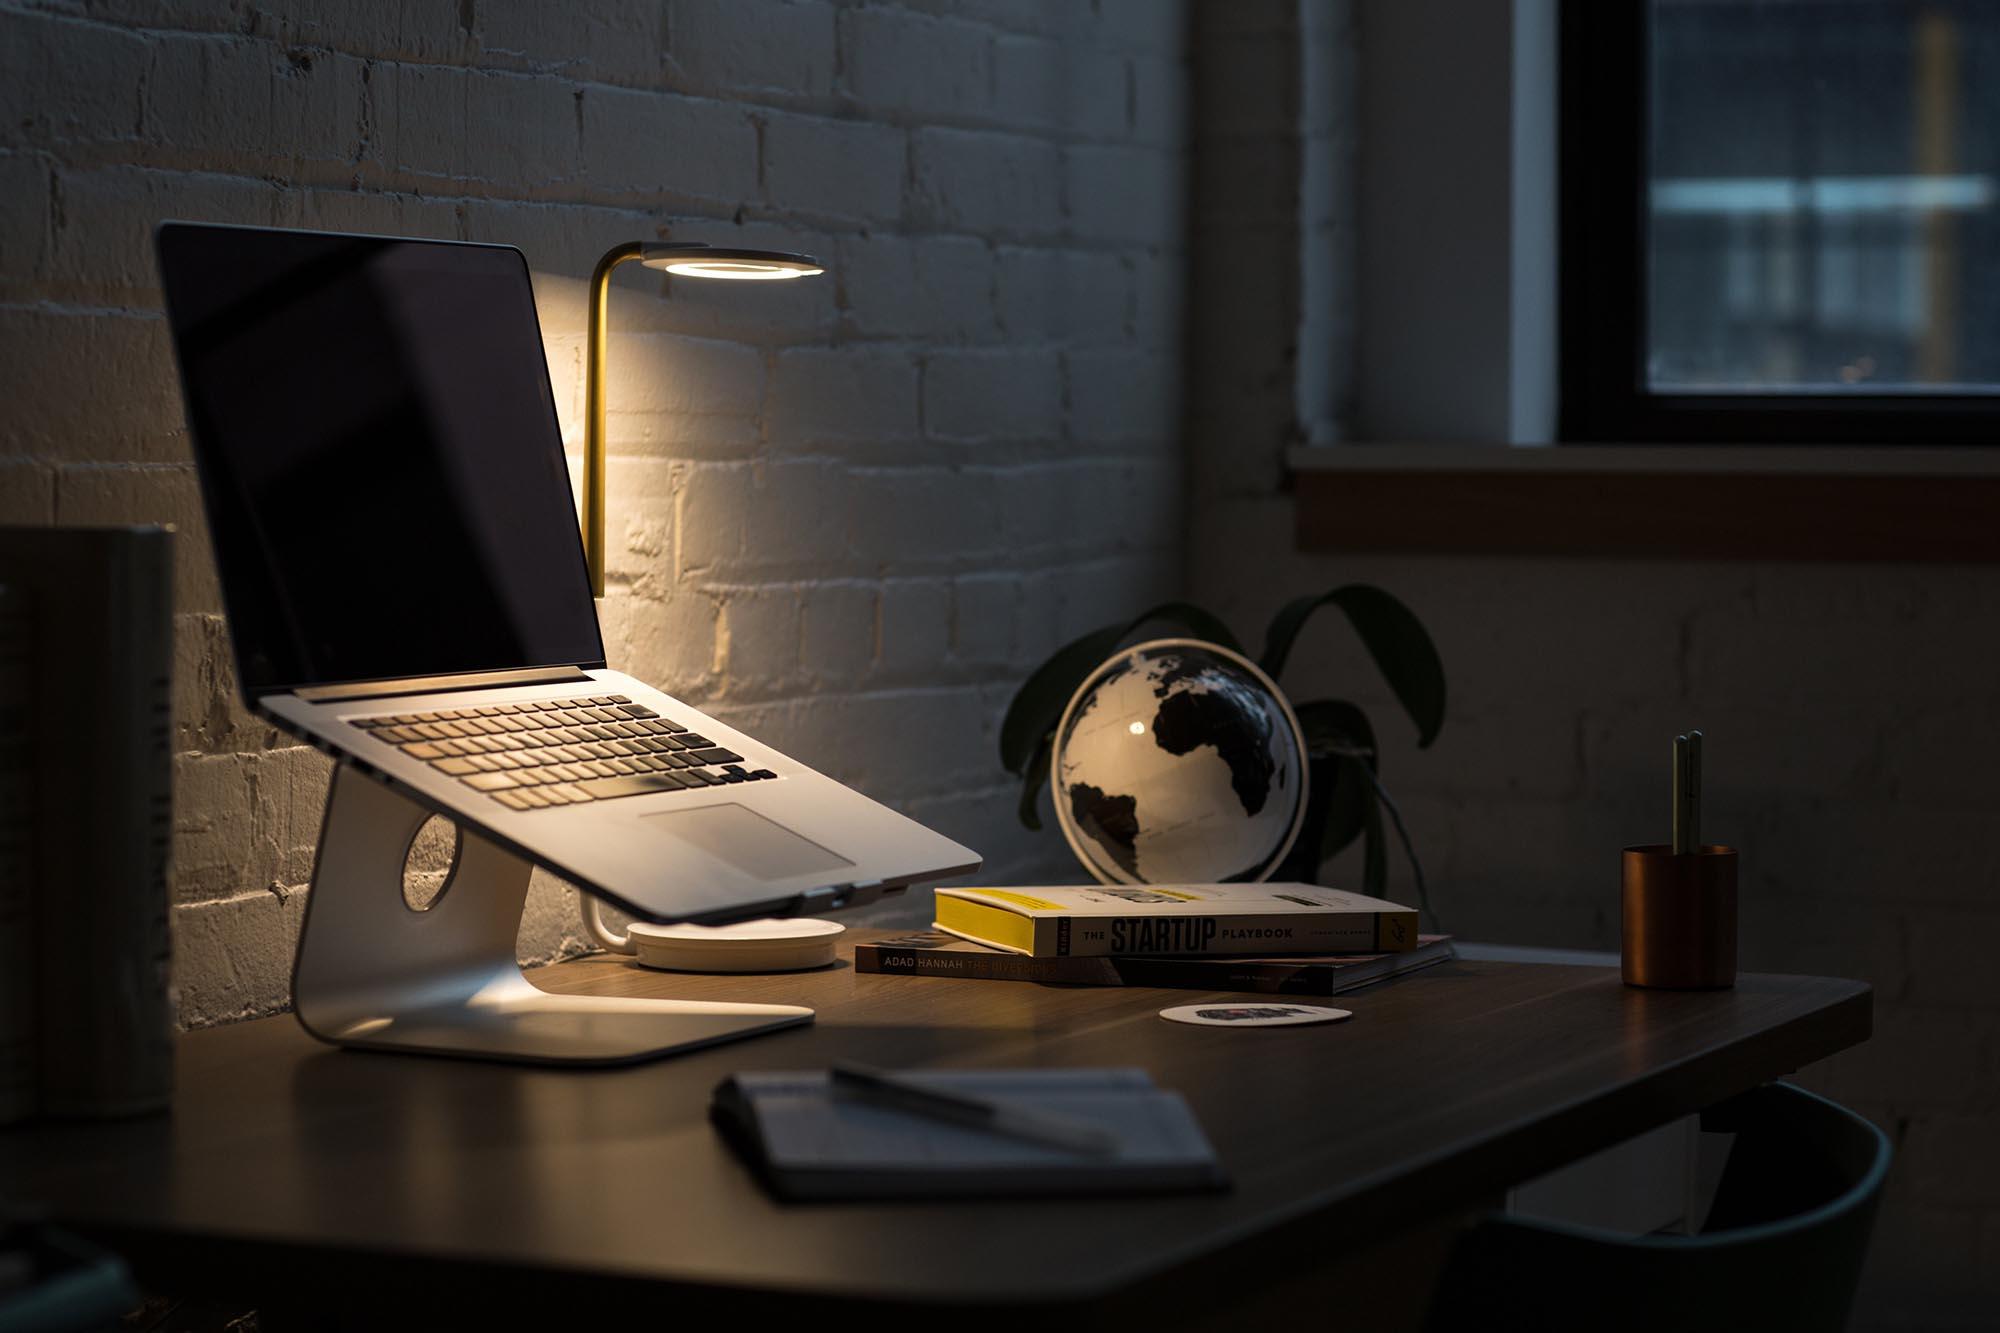 laptop working late night remote work